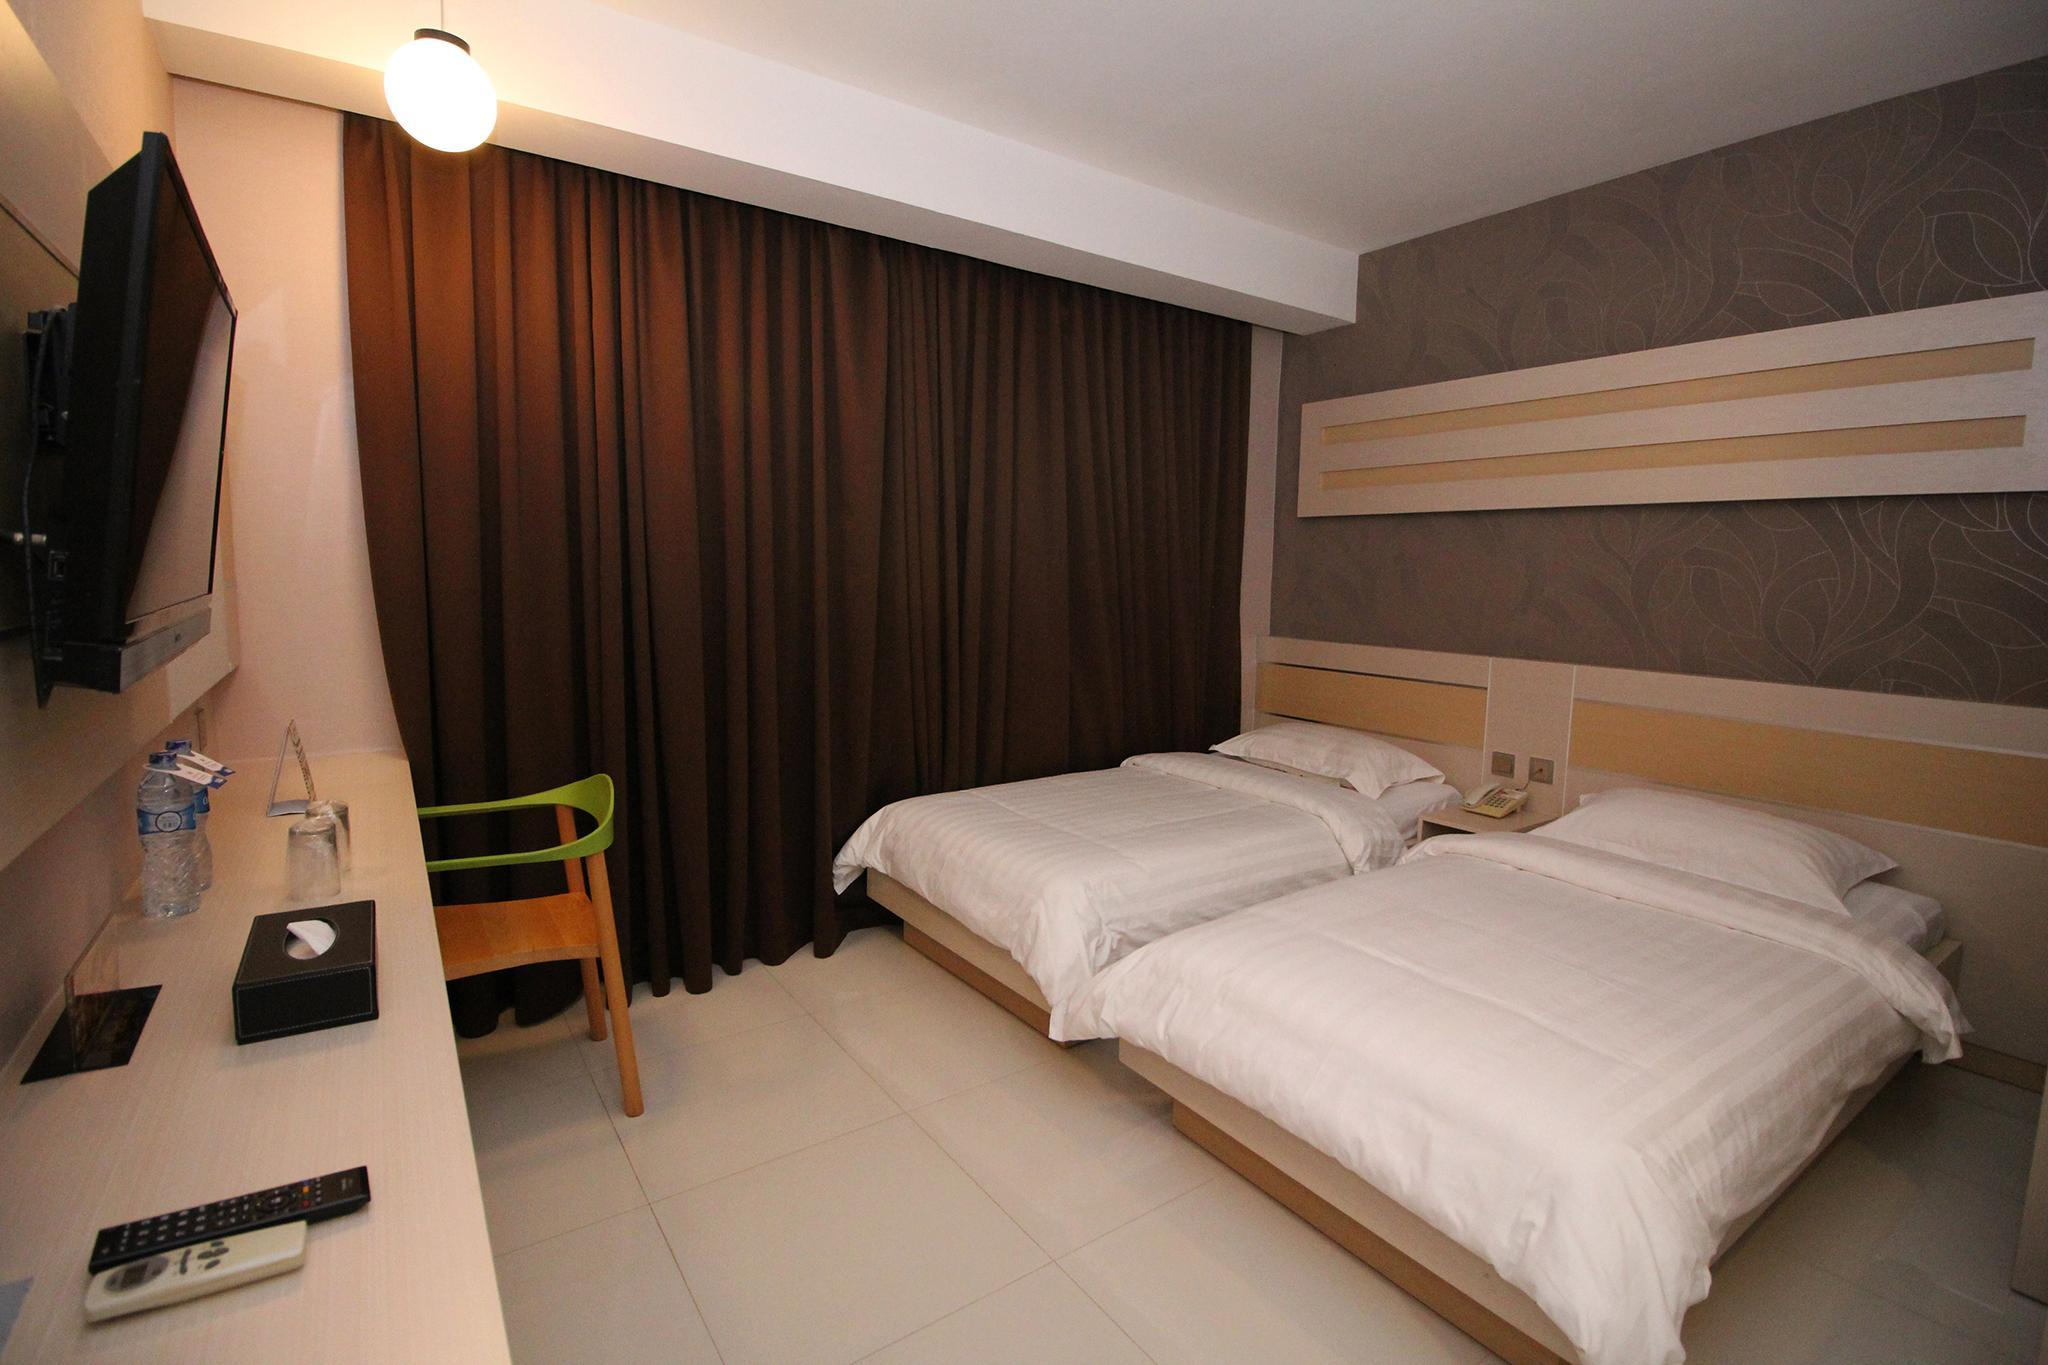 Hotel Classie Palembang Indonesia